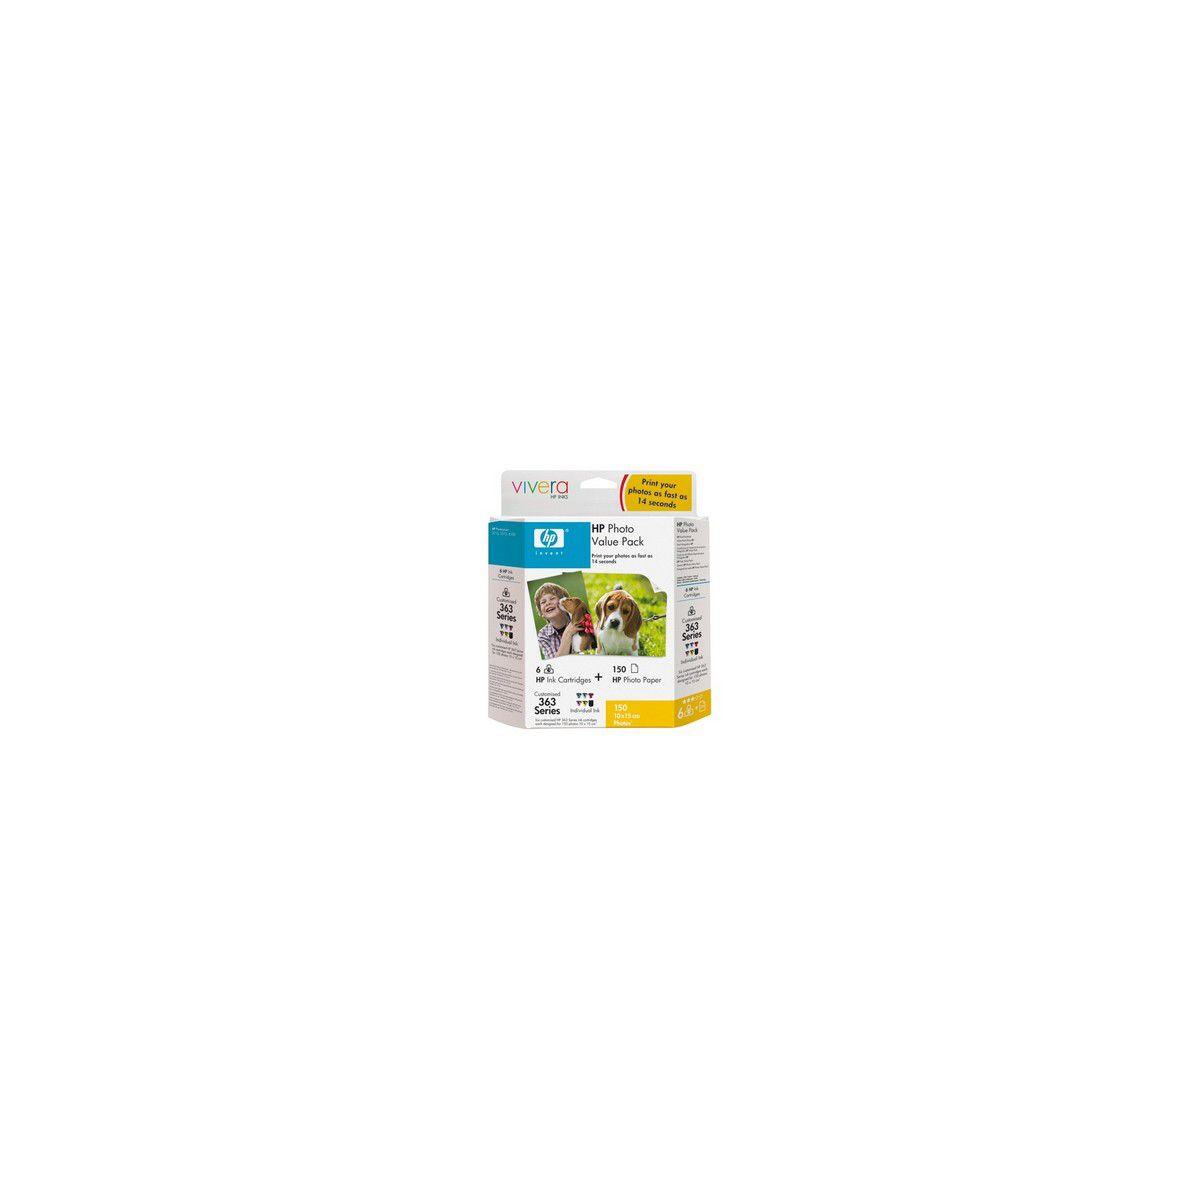 Cartouche HP N°363 Photopack (+150F 10*1